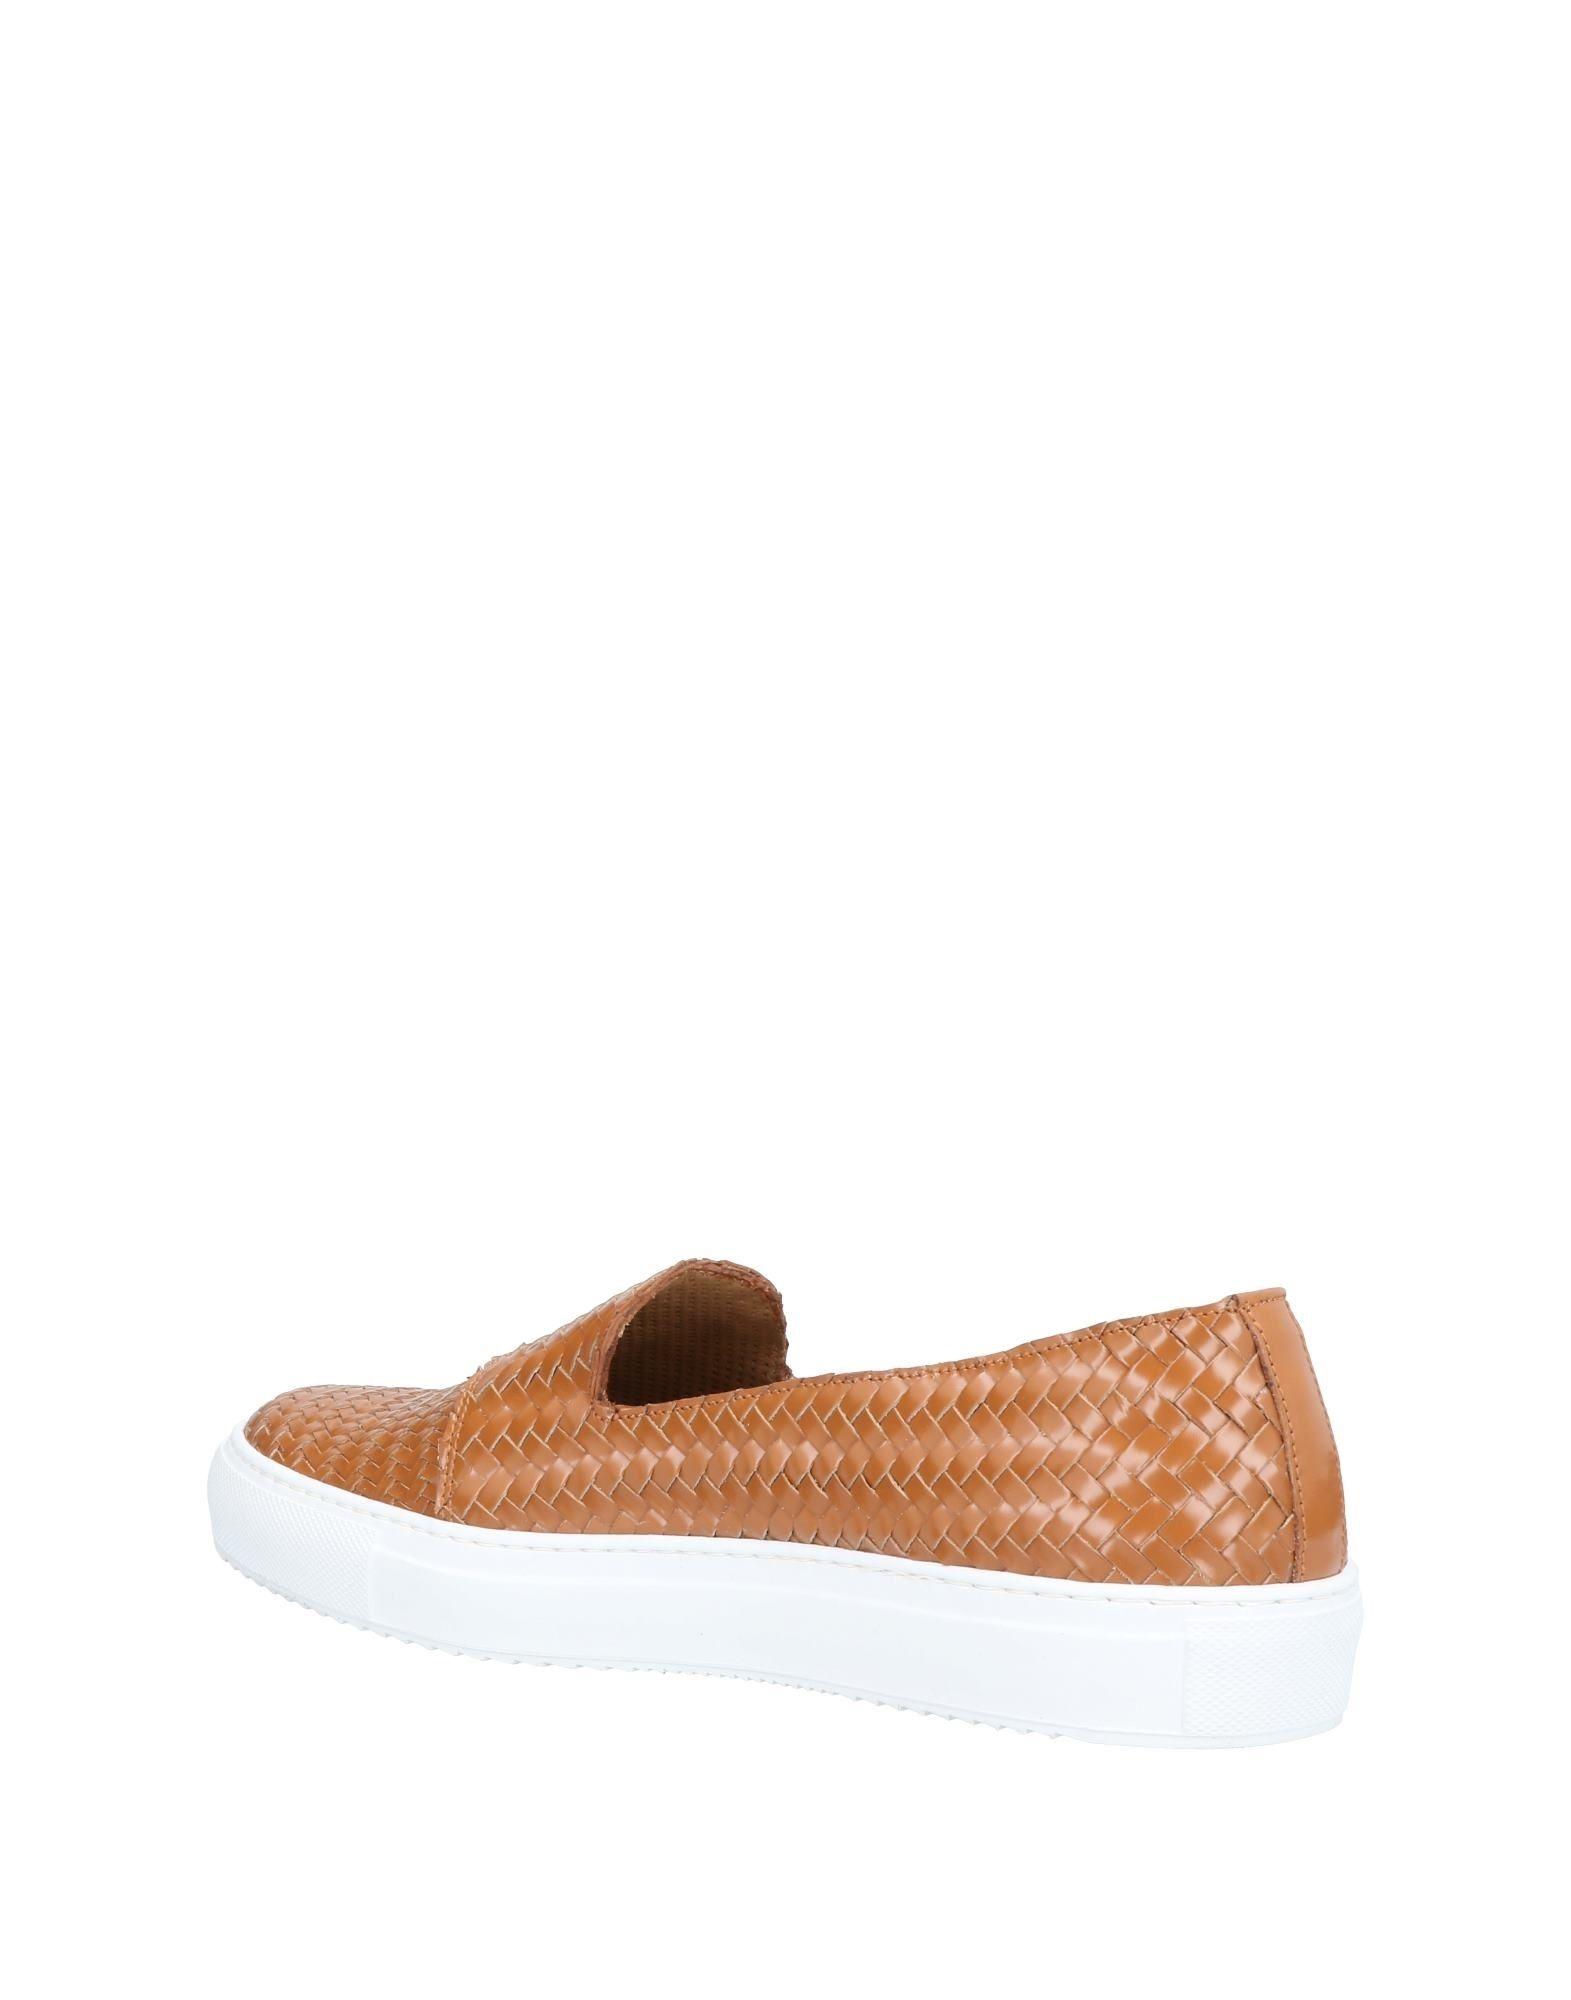 Sneakers Raparo Femme - Sneakers Raparo sur